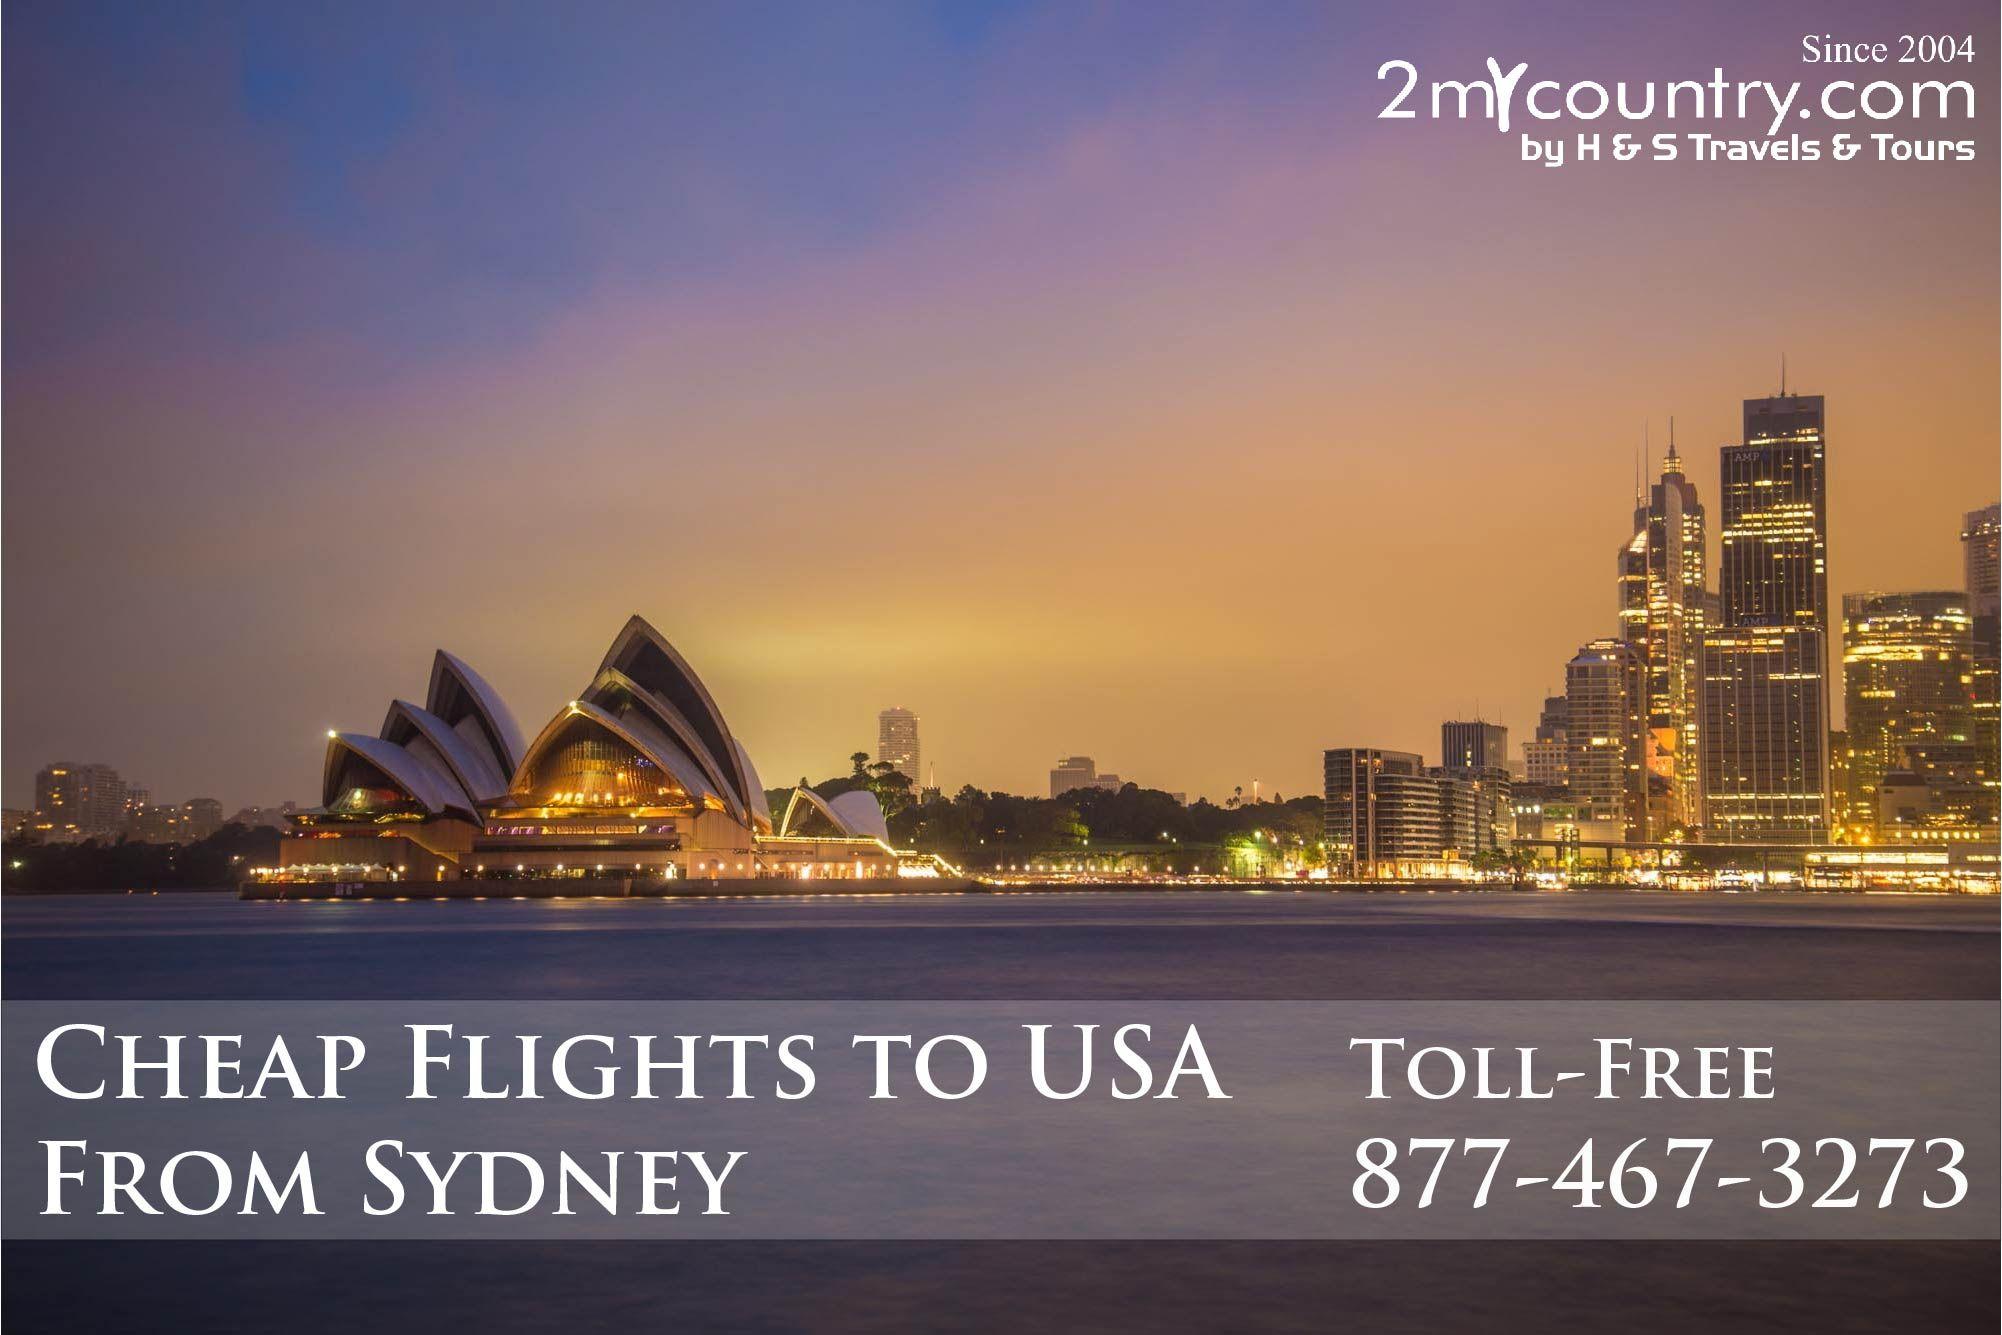 Cheap flights from Sydney, Australia (SYD) to Popular Destination in the United States (US) Dallas $782. Honolulu $302. Houston $667. Las Vagas Nevada $692. California $624. Miami, Florida $780. New York City $732. Washington, District of Columbia $753. CALL NOW 877-467-3273.   #jfktosydflights #cheapflights #flightdeals #flightdeals #2mycountry #flighttickets #airfares #cheapairfares #cheapairdeals #cheapairline #businesstickets #travel